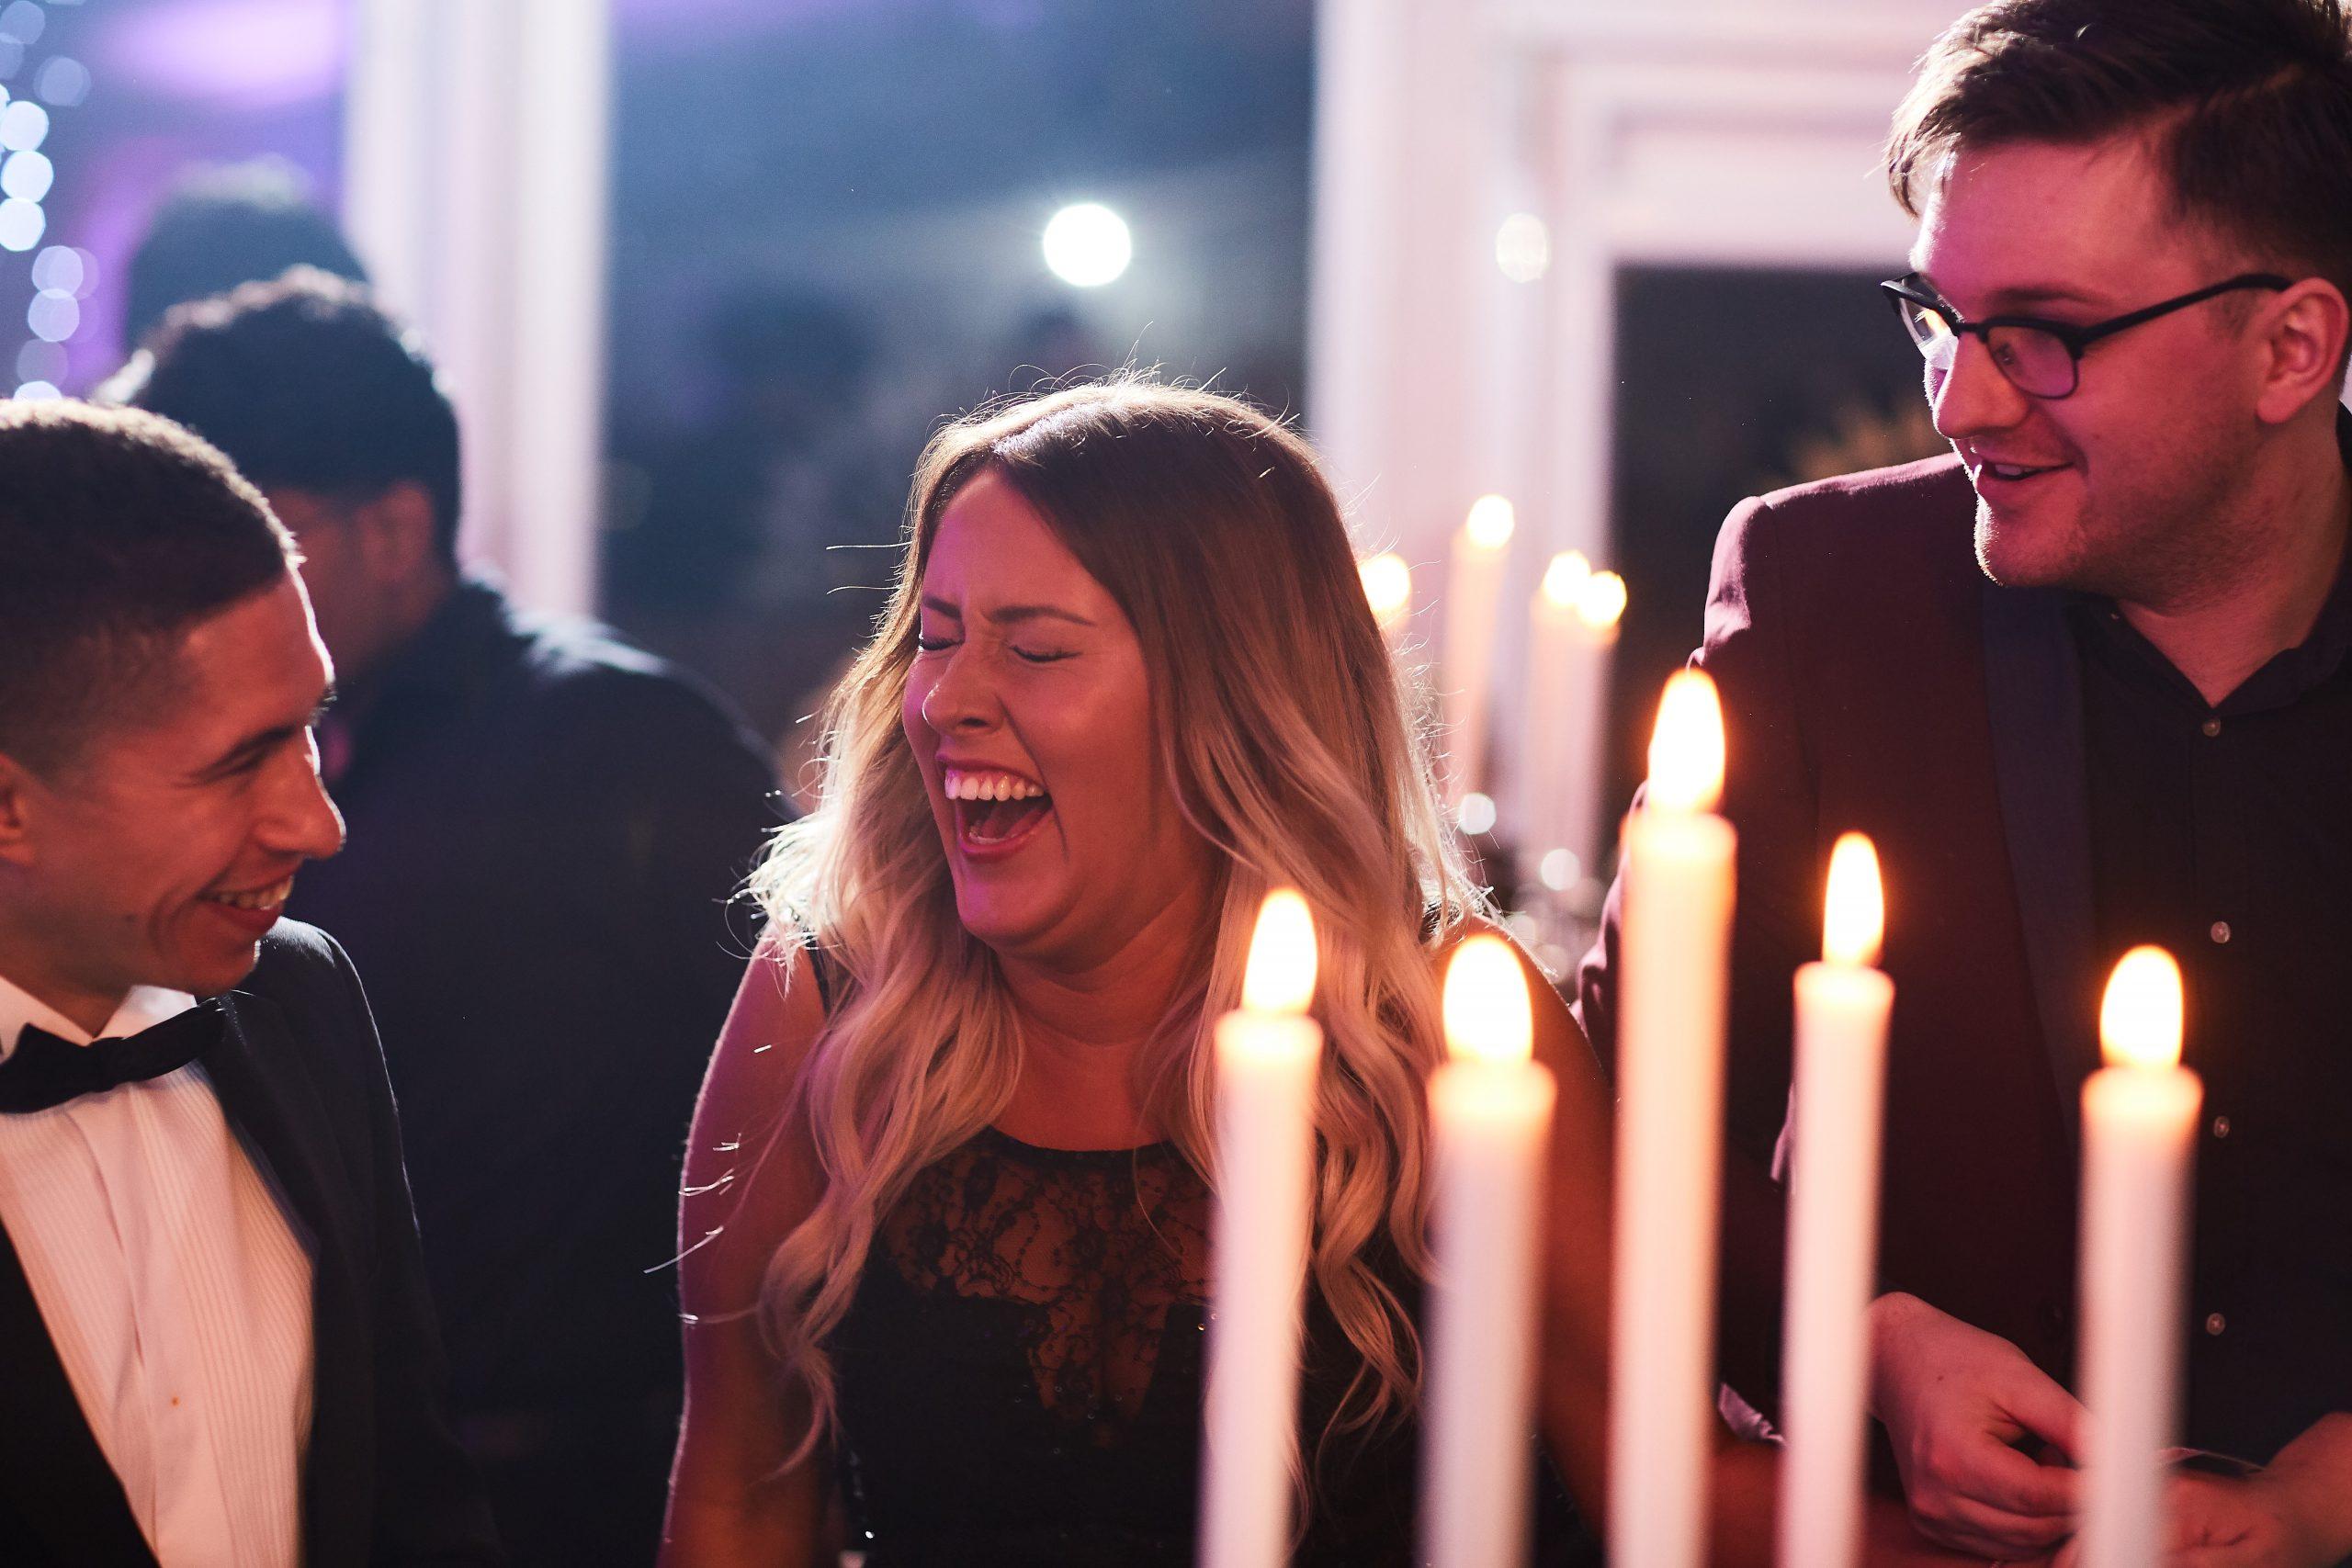 https://www.arronjones.co.uk/wp-content/uploads/2021/02/wedding-magician-scaled.jpg